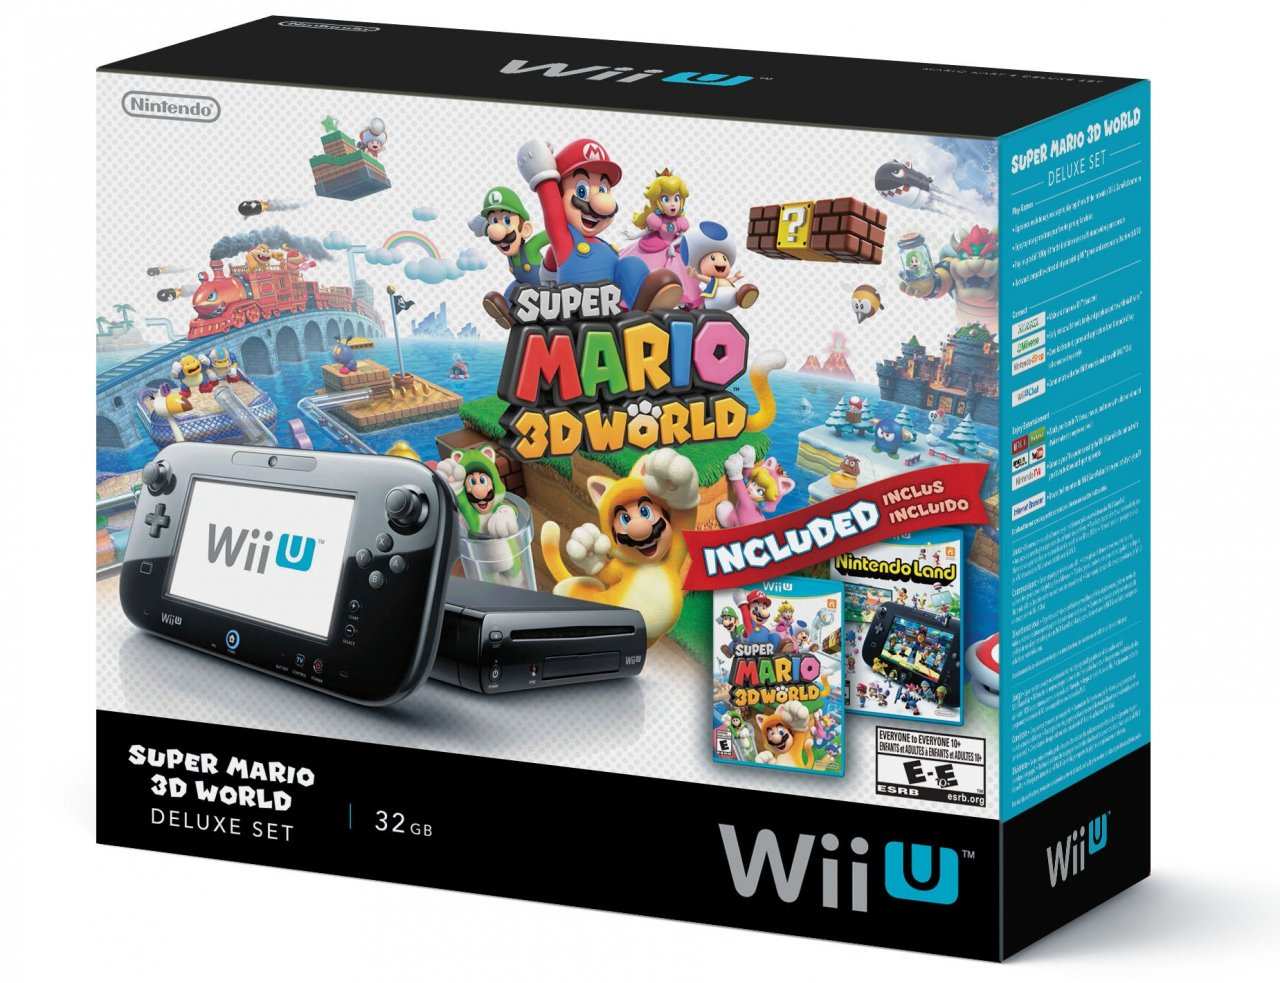 Nintendo of America Store Offering Refurbished Super Mario 3D World ...